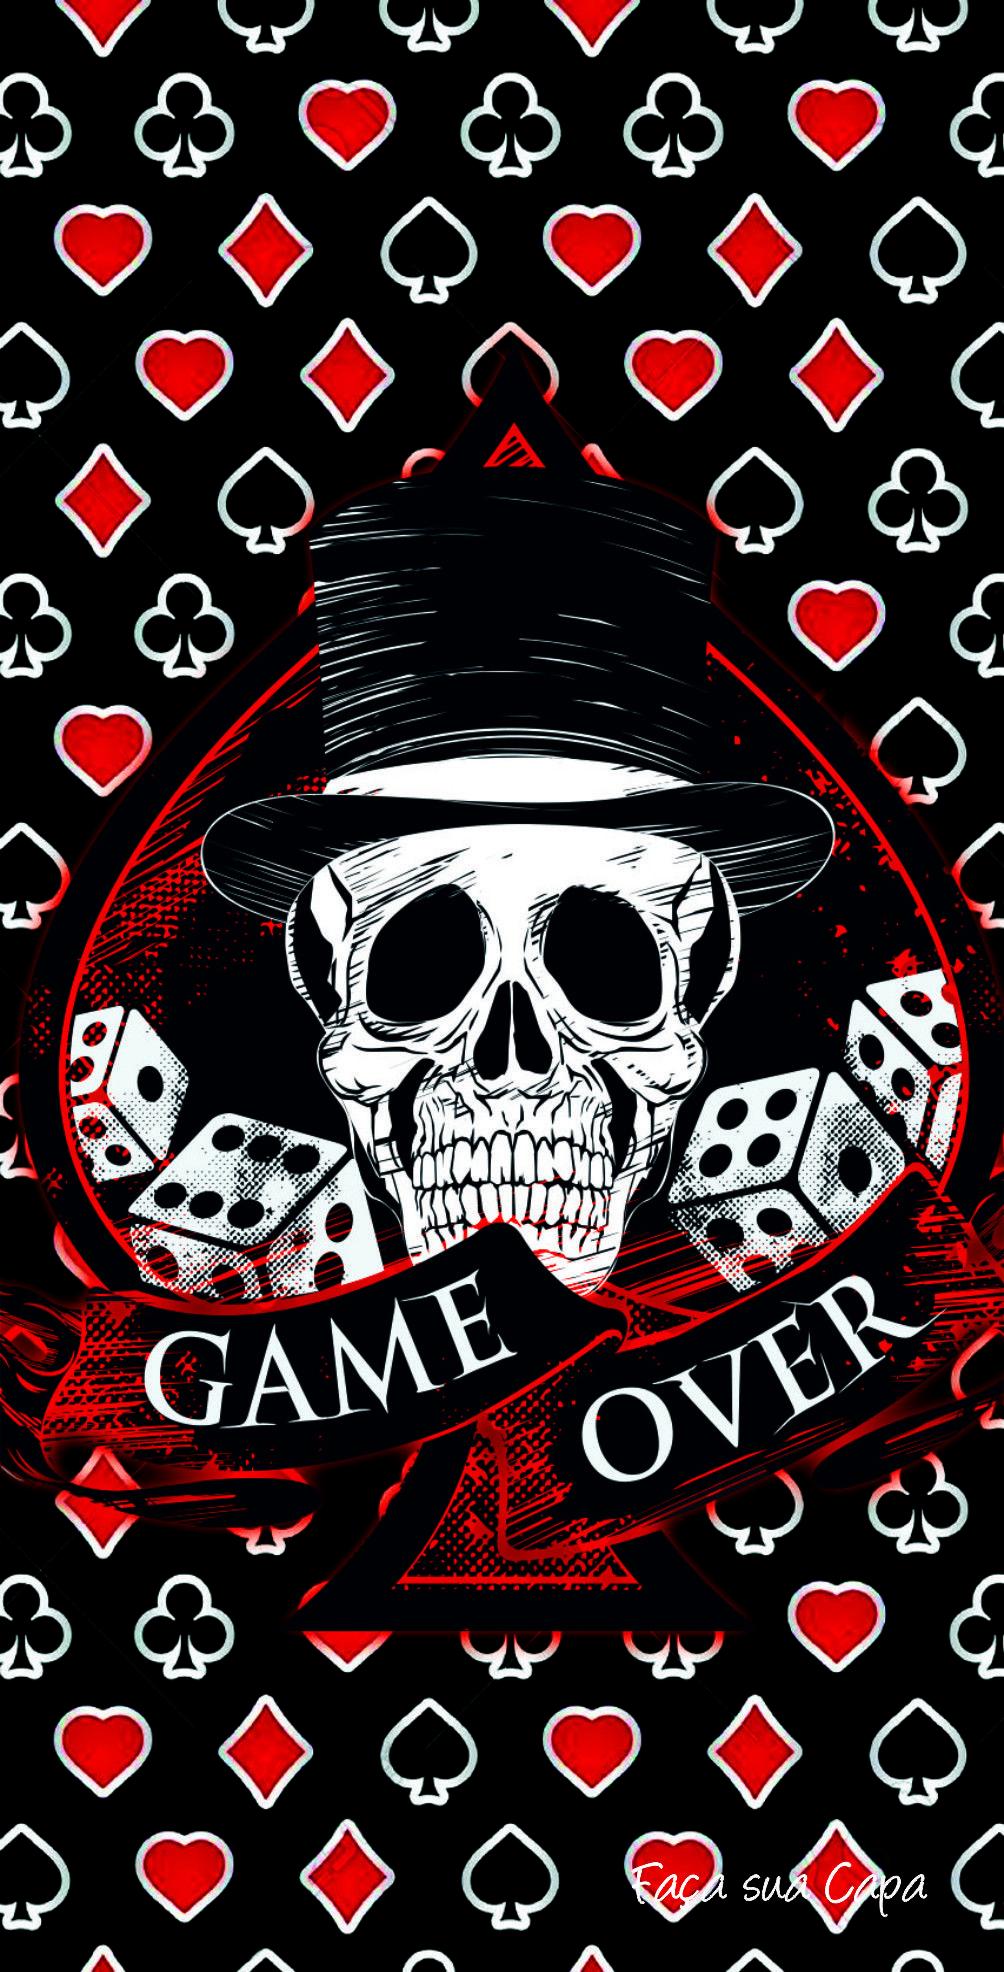 GAME OVER | Cool | Pinterest | Wallpaper, Skull wallpaper and Iphone wallpaper